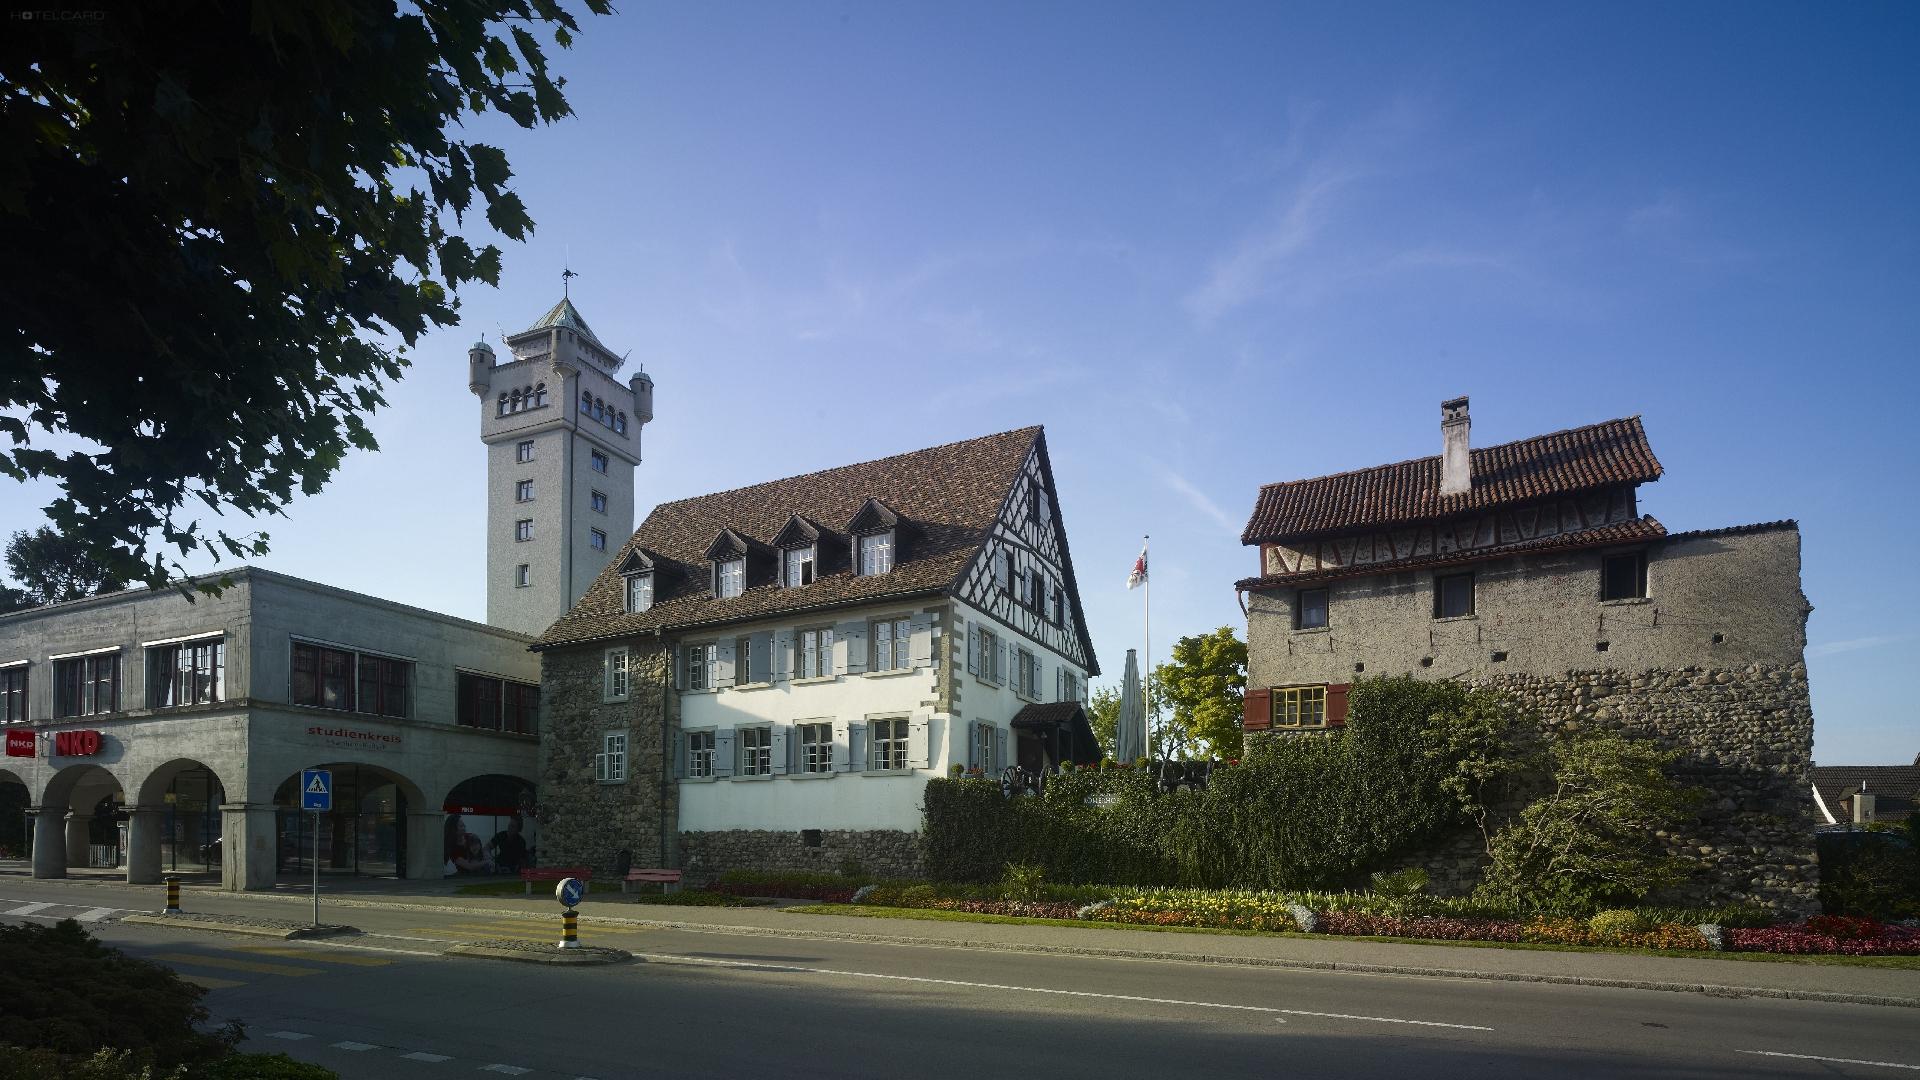 Restaurant - Hotel de charme Römerhof 0